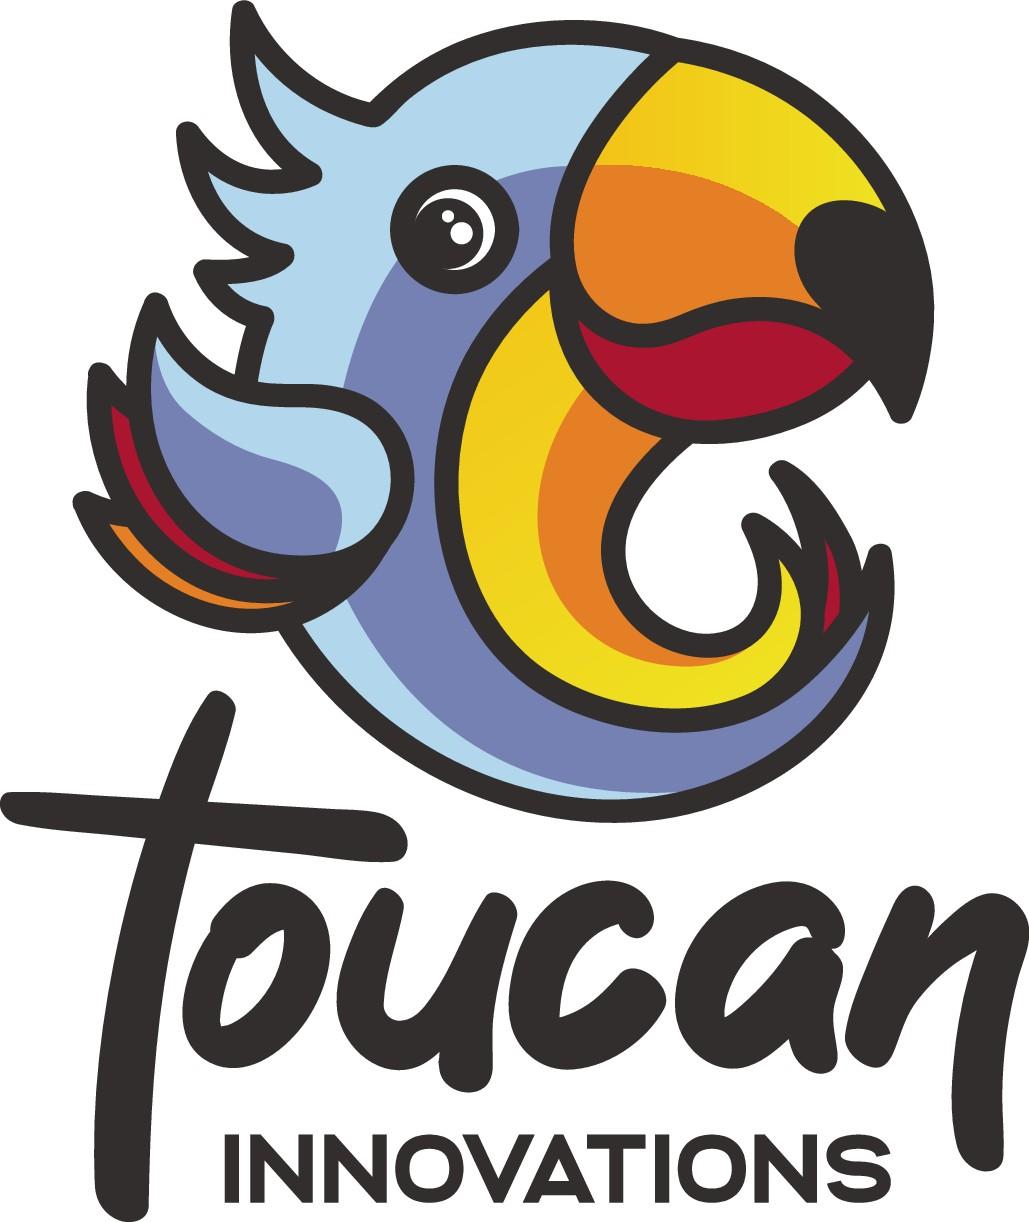 Design a Toucan Logo for Drink bottles